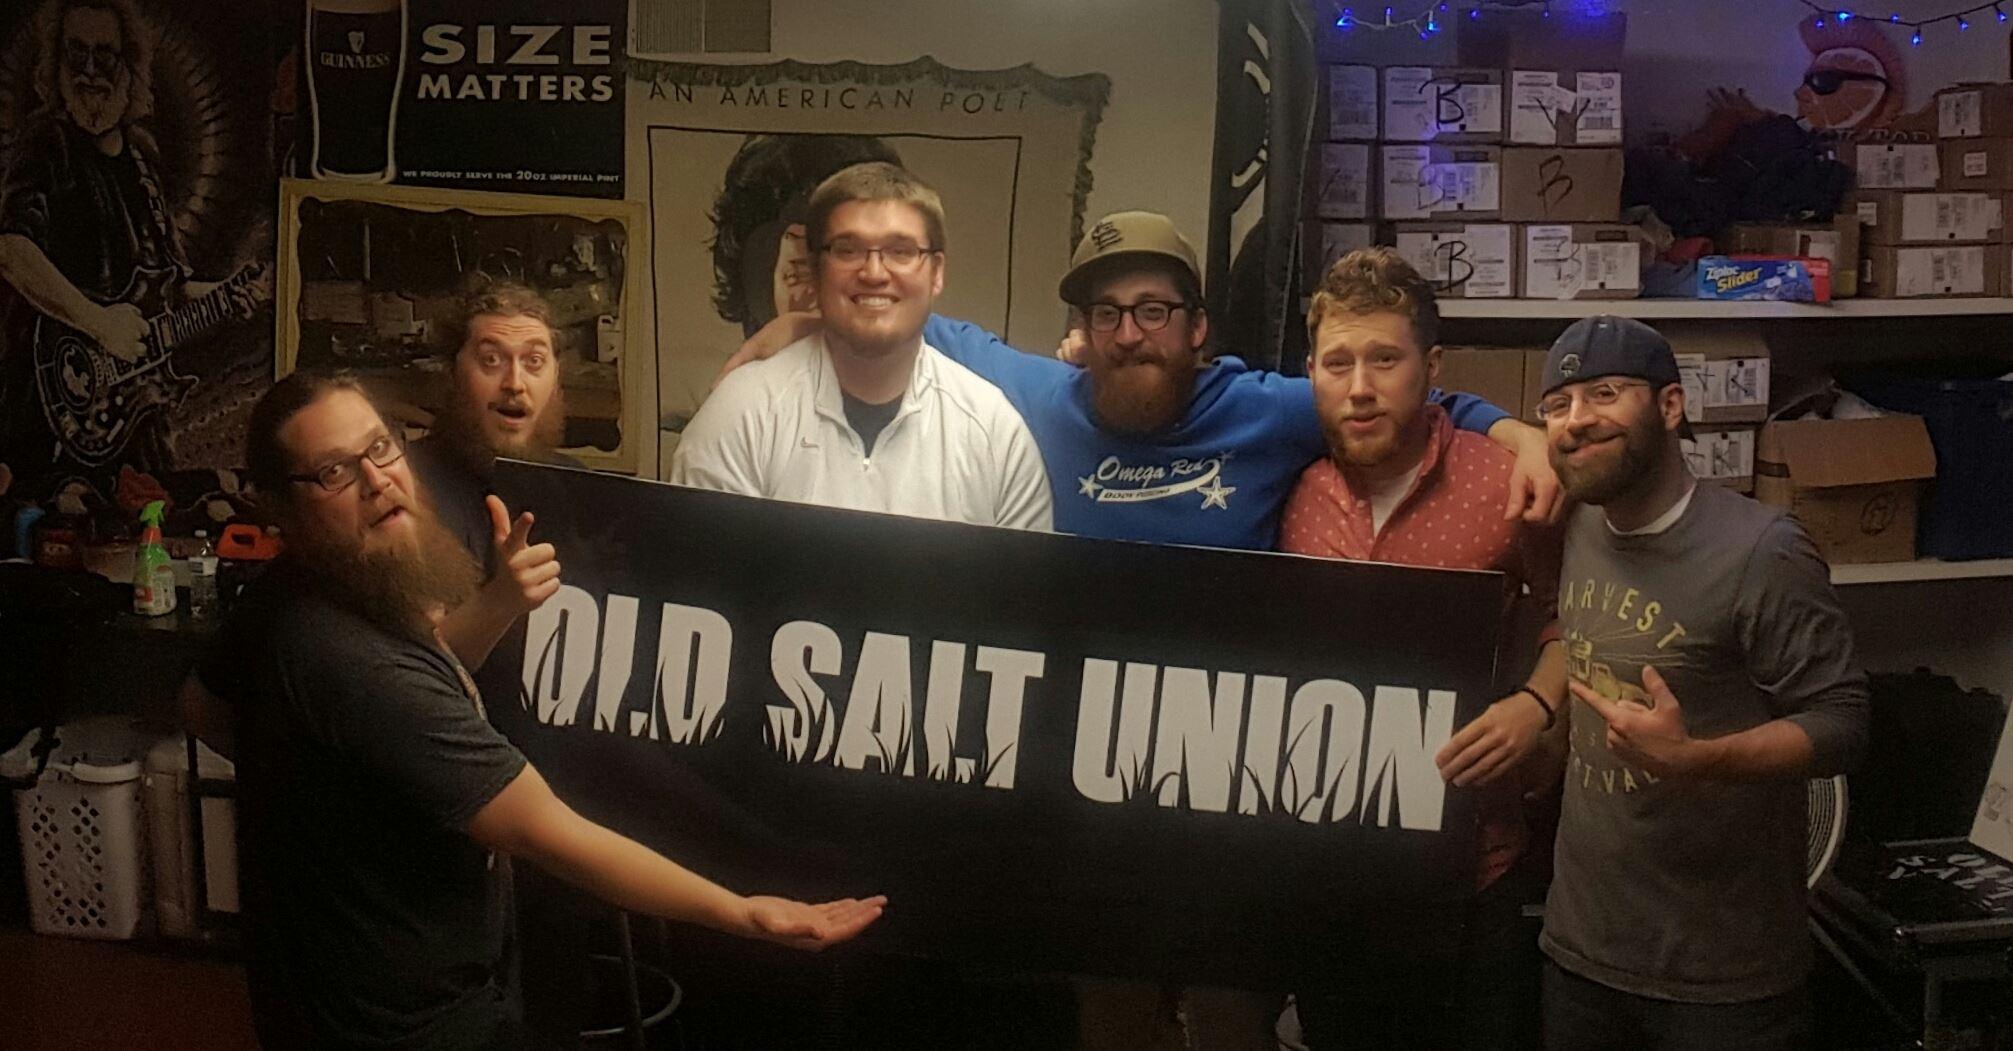 Episode 190- Old Salt Union